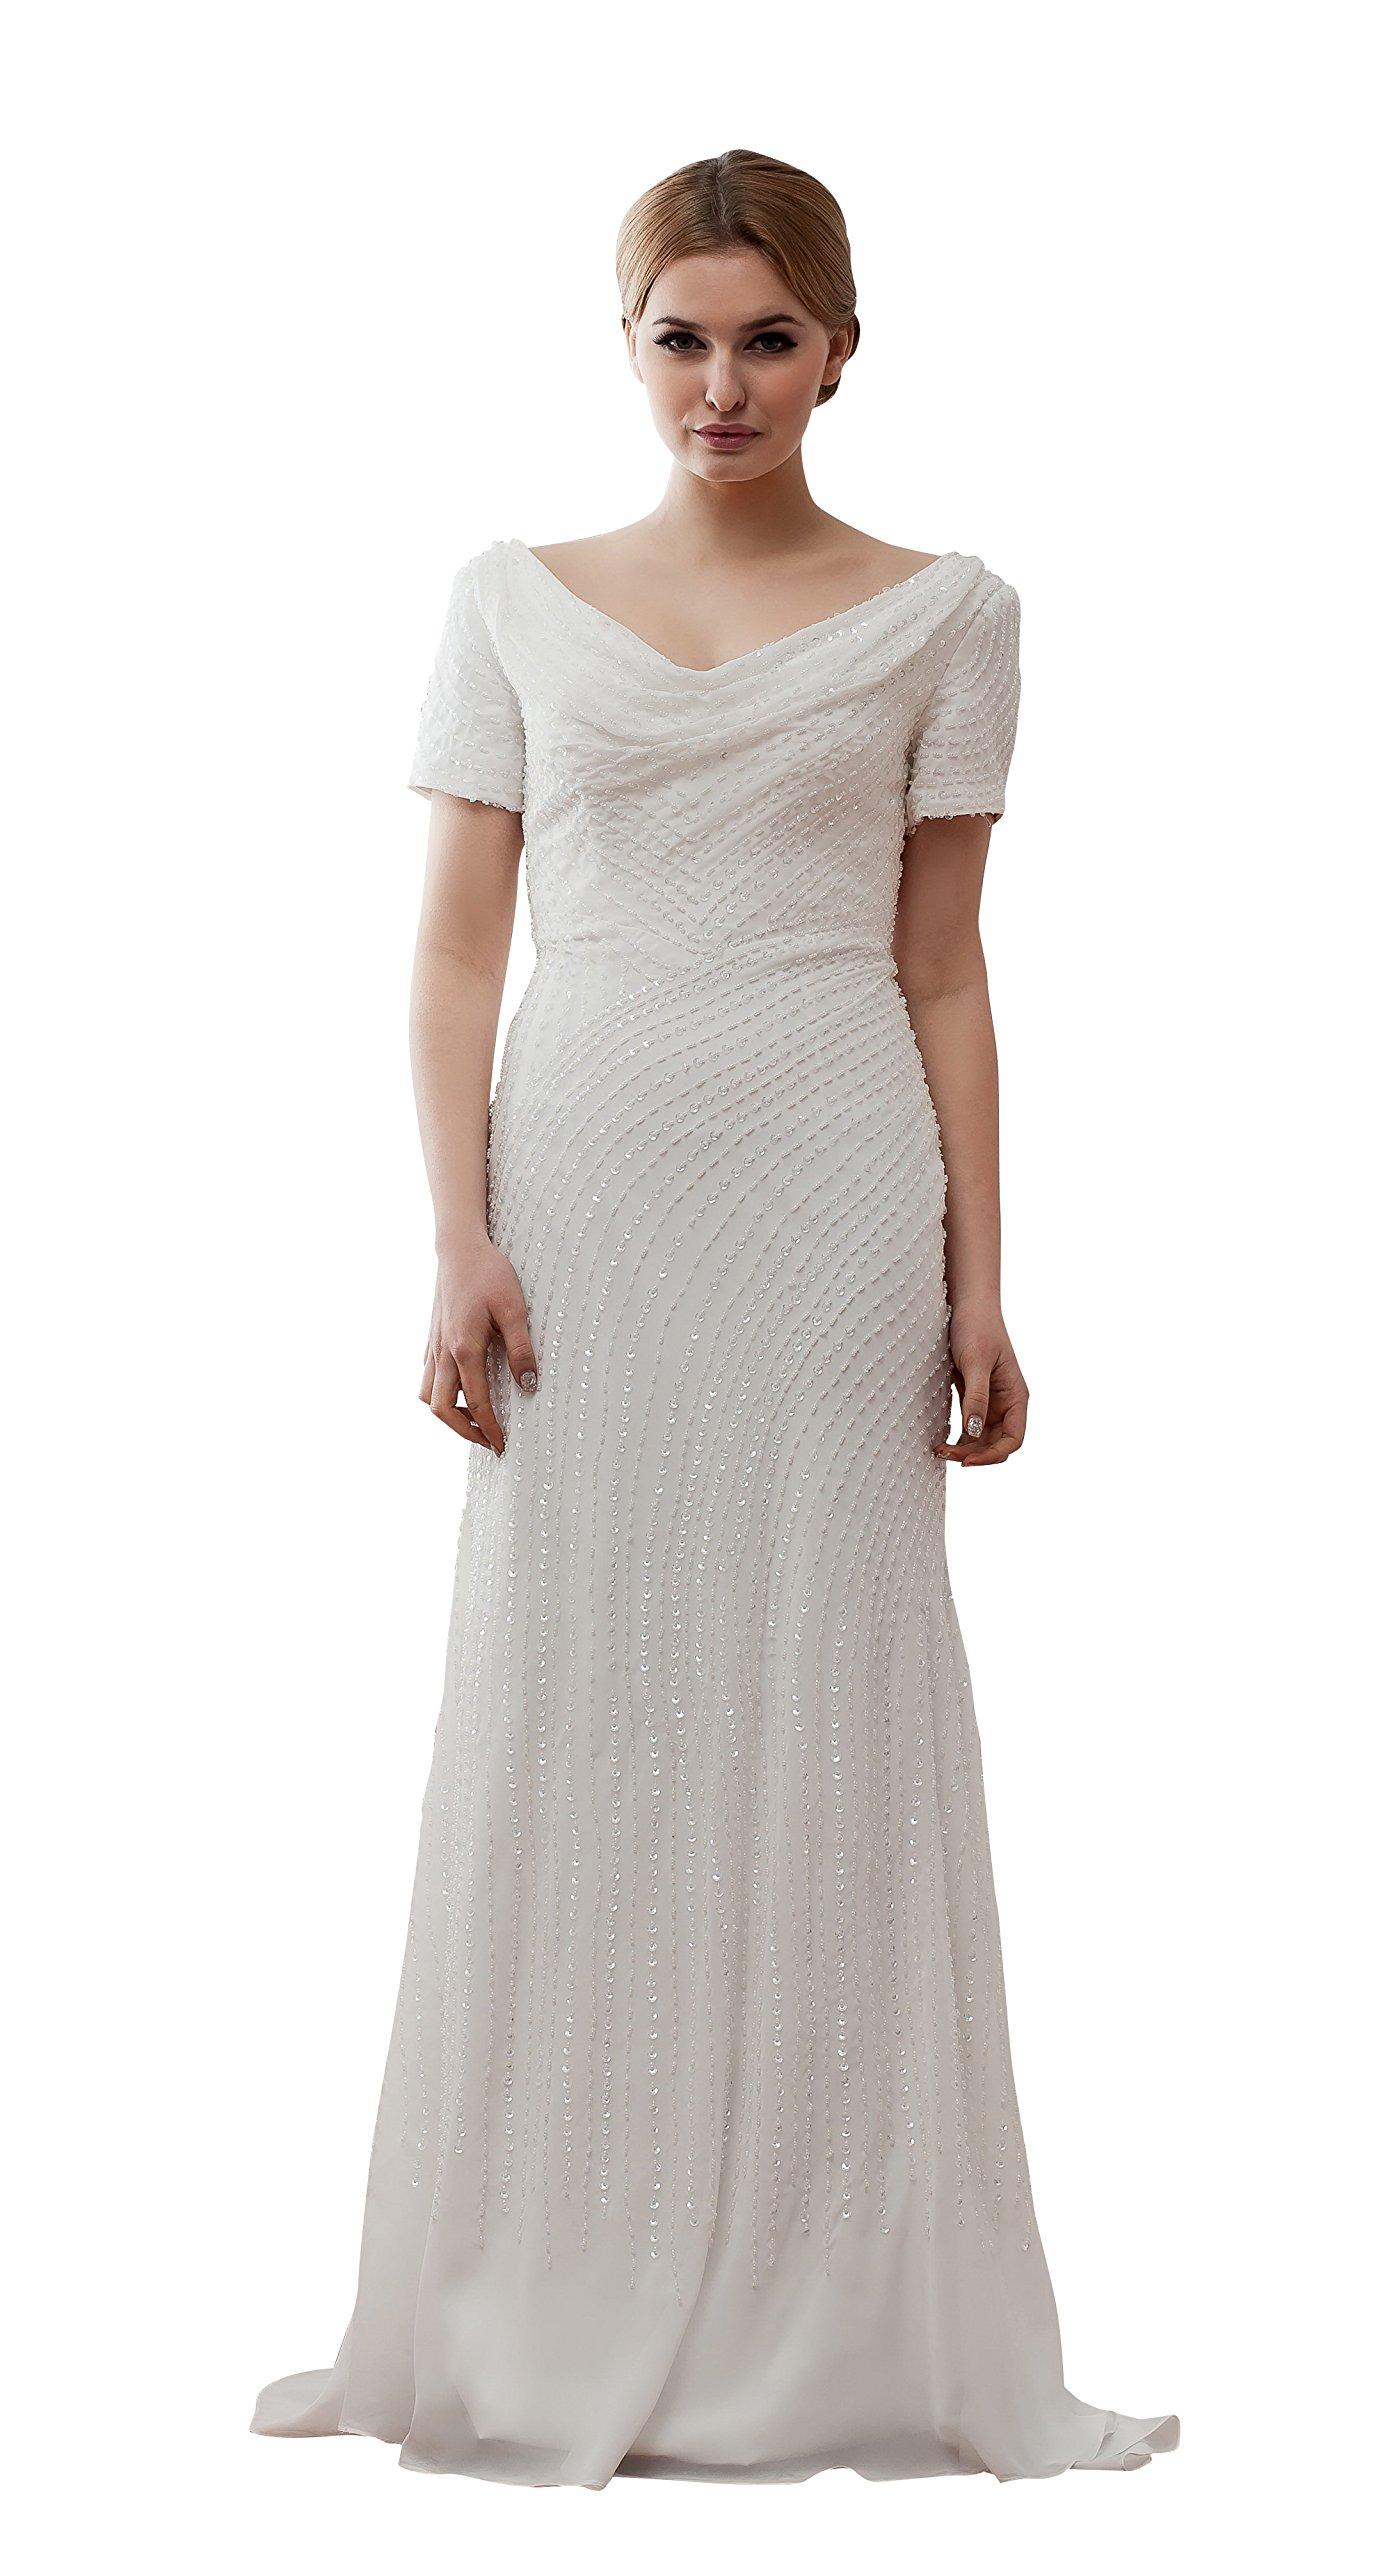 Vogue007 Womens Short Sleeve V Neck Sewing Bead Pongee Tulle Satin Wedding Dress, White, 16W